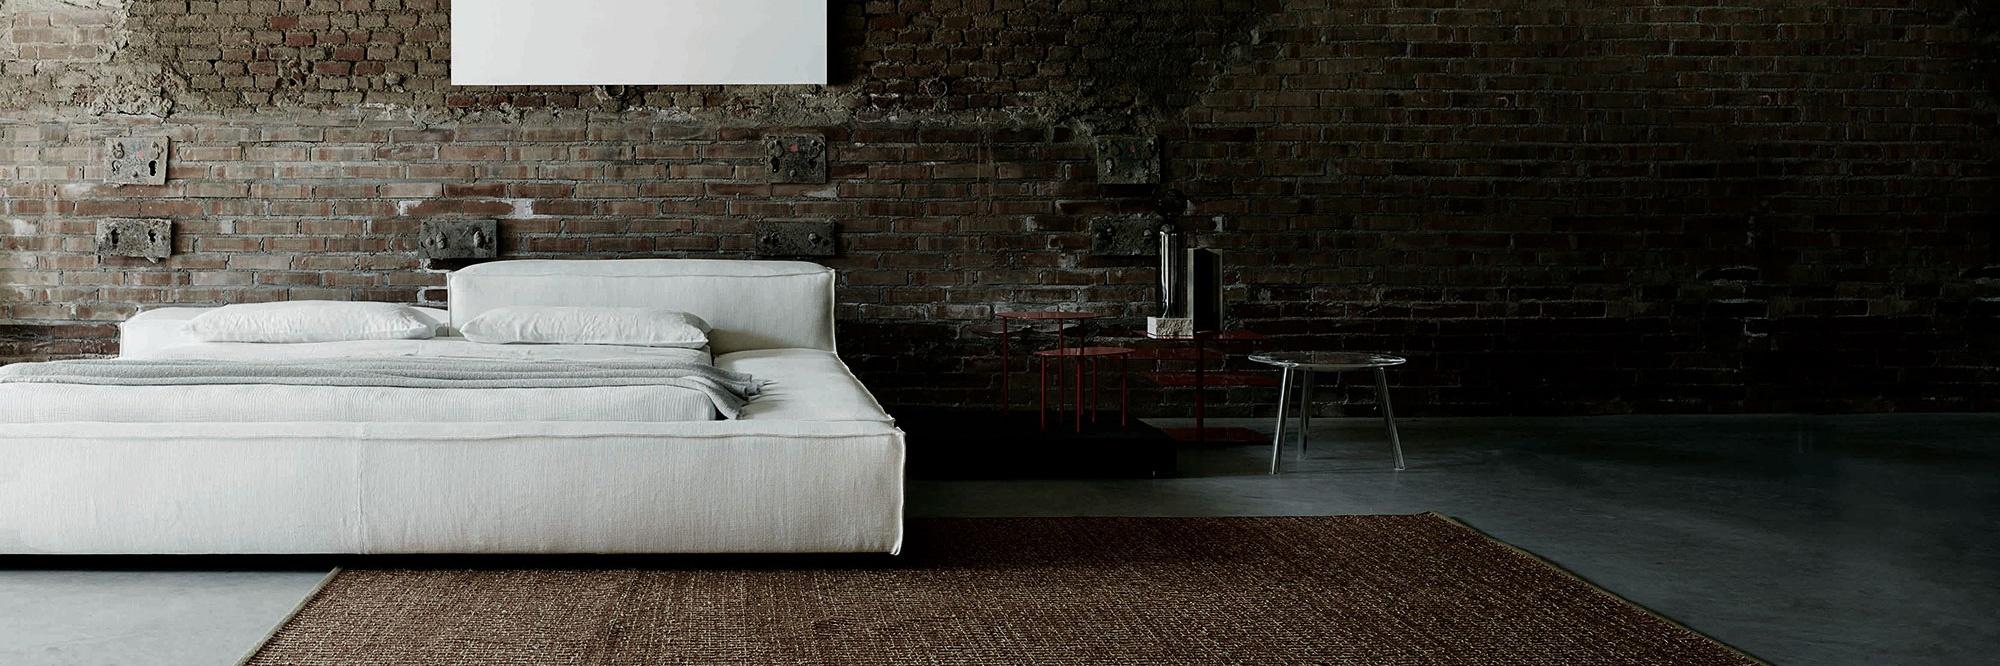 Colombo Divani A Meda lissoni & partners   product   living divani   extrasoft   bed